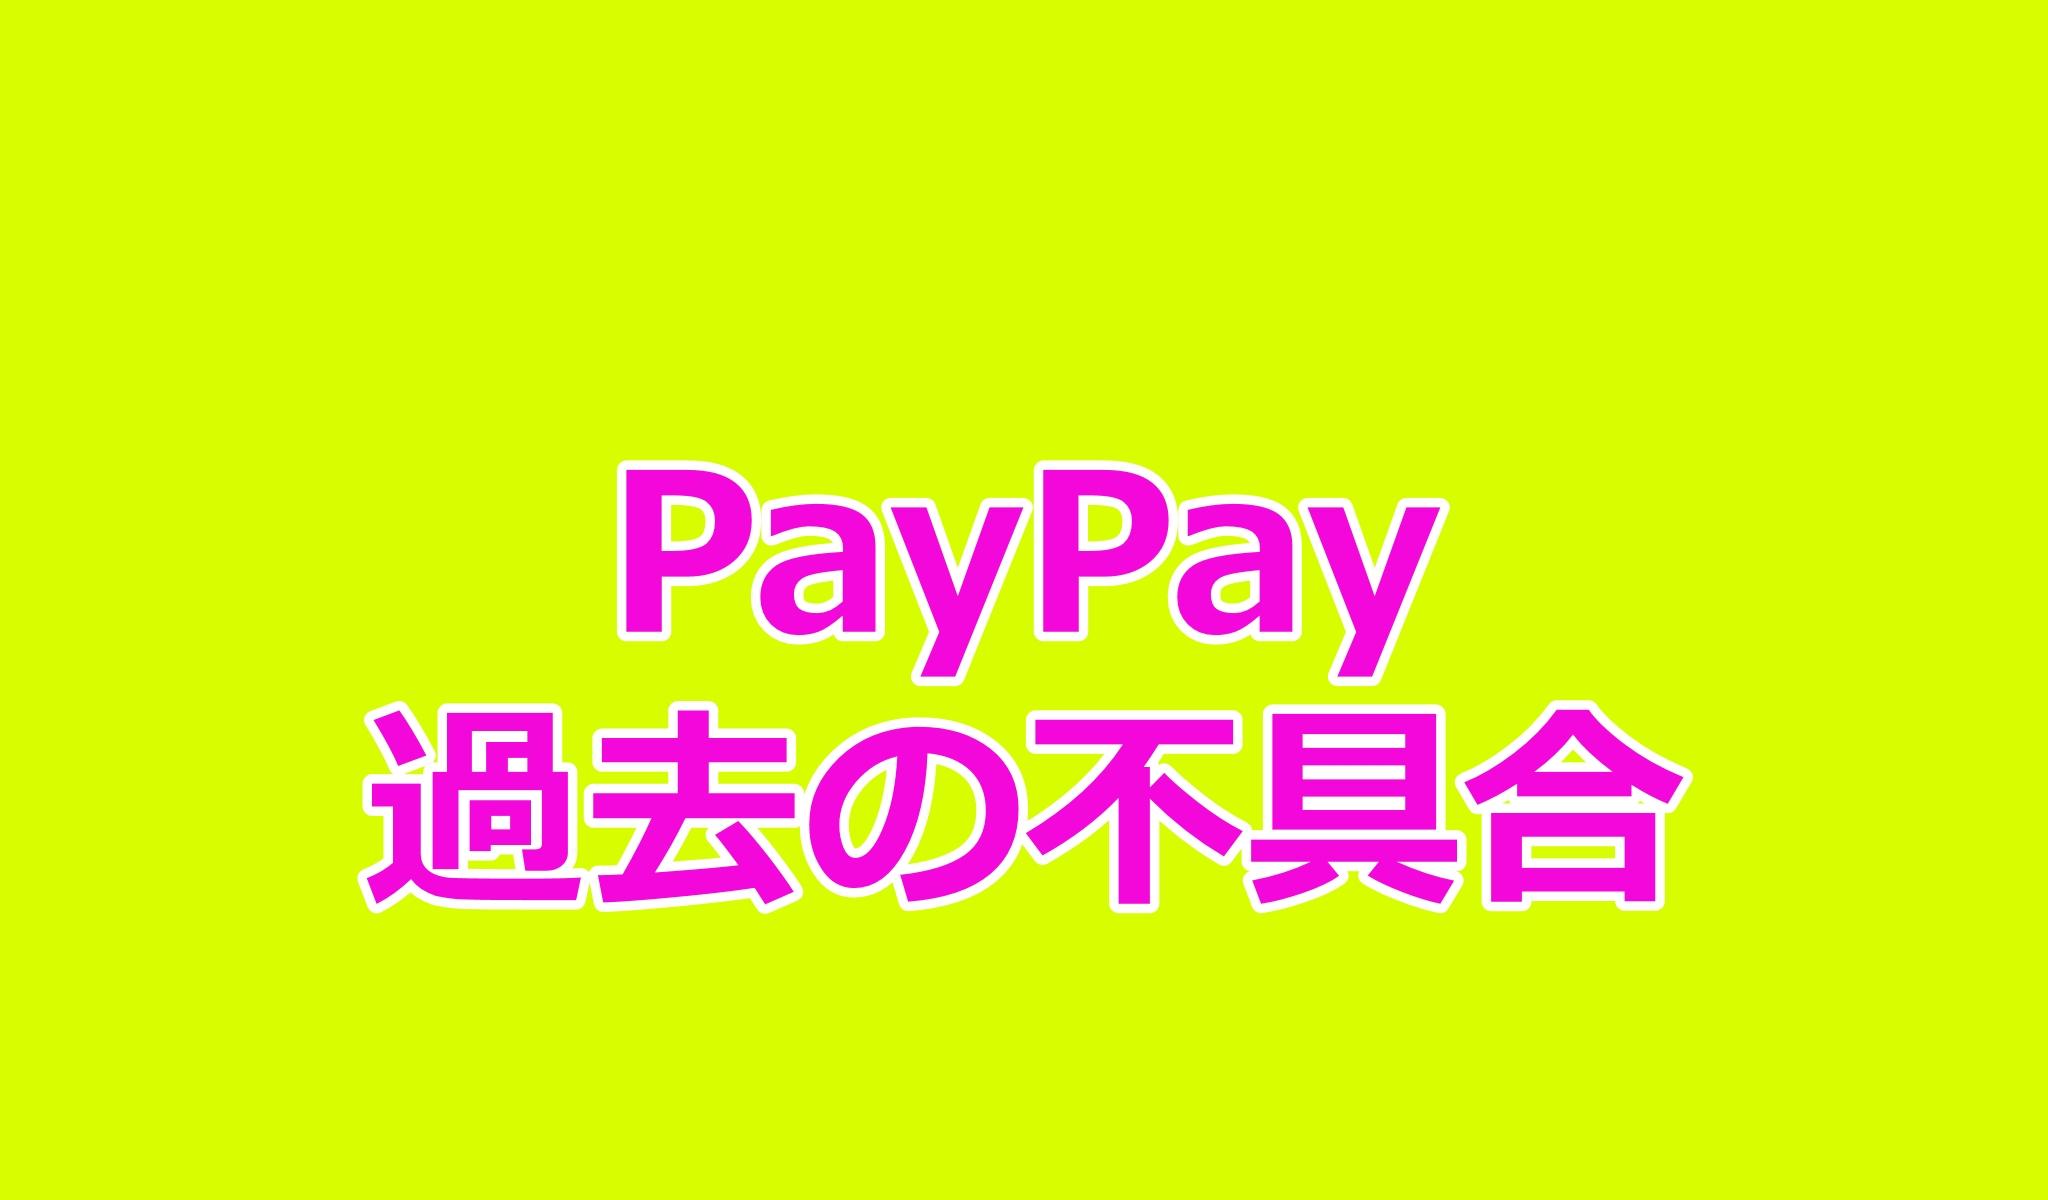 PayPay過去の不具合